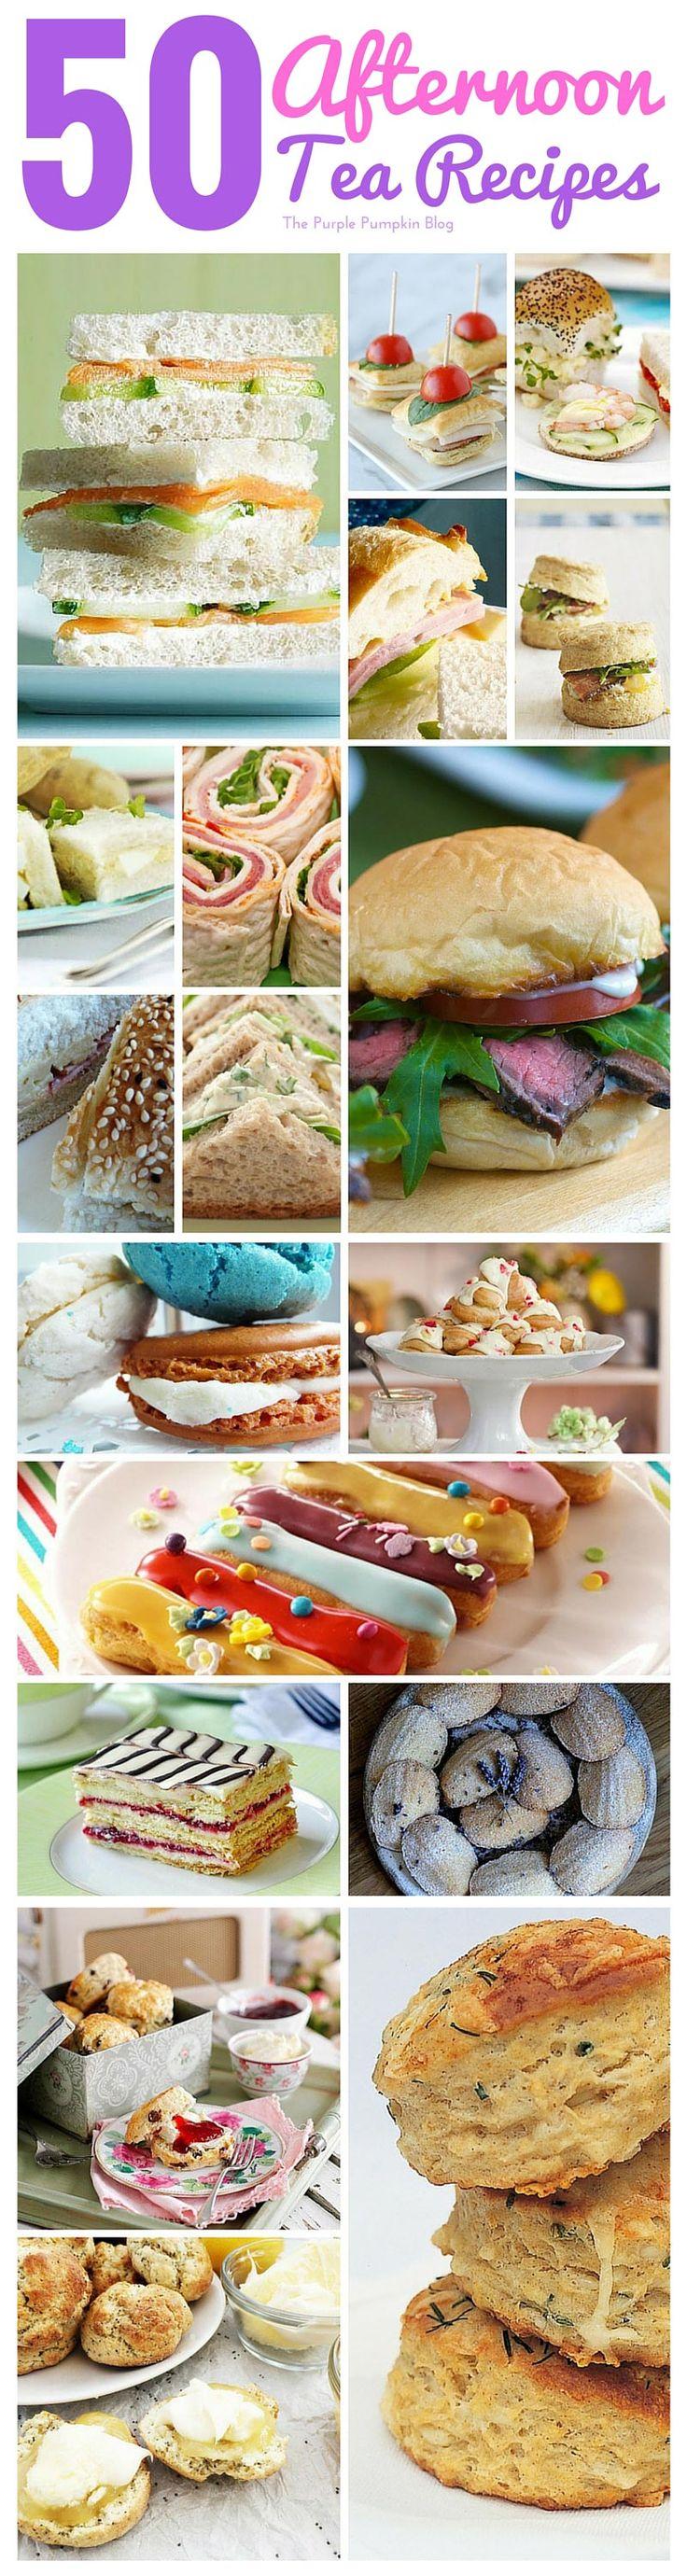 50 Afternoon Tea Recipes